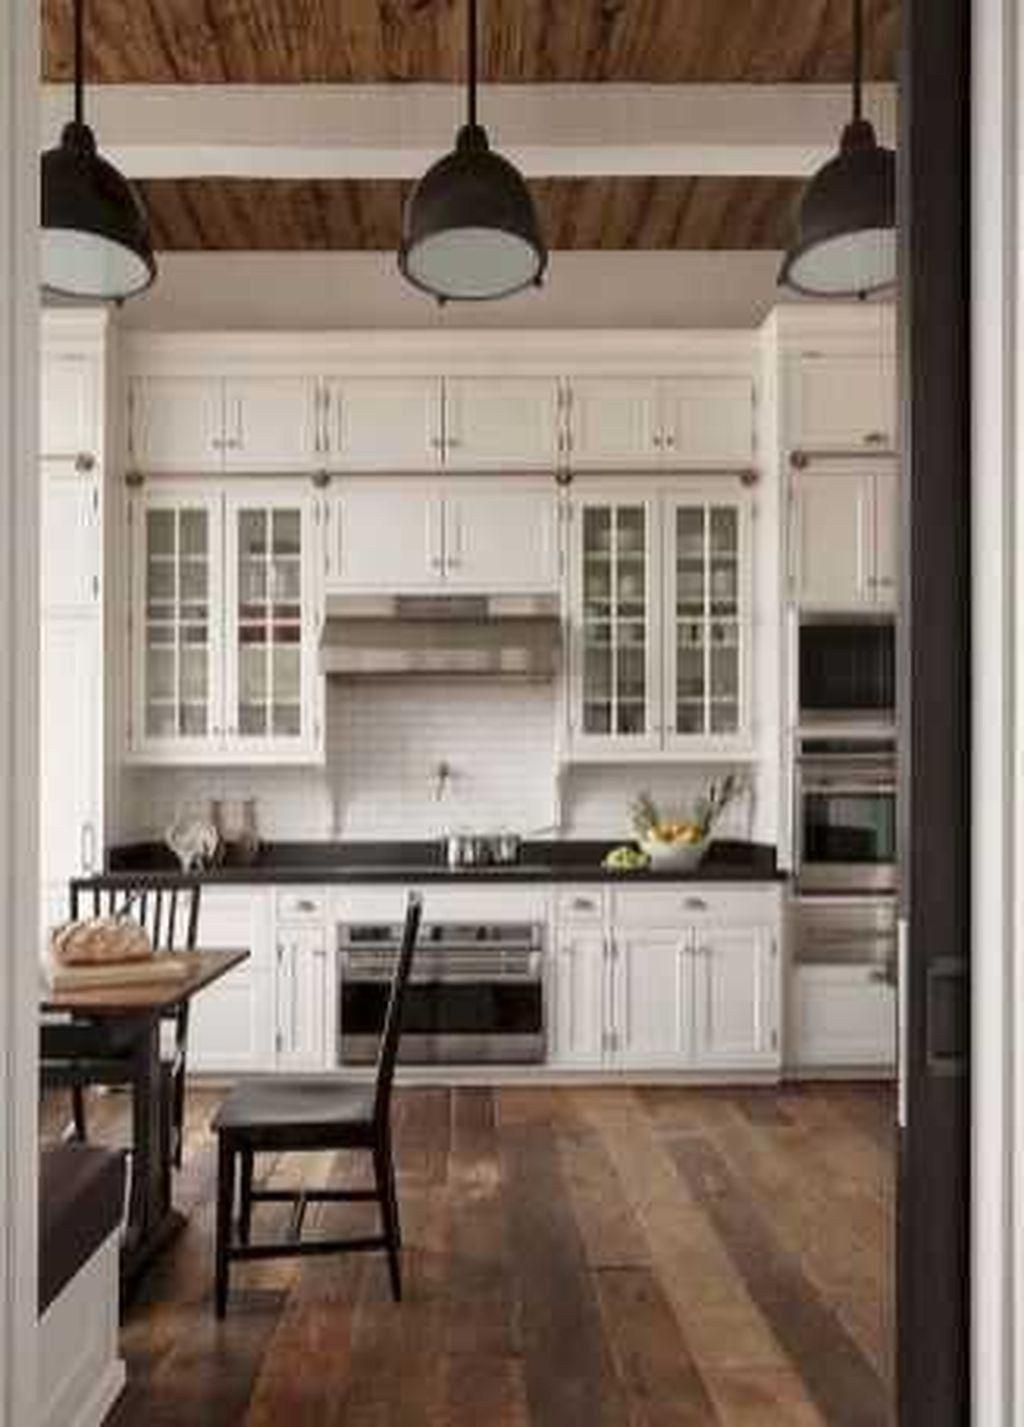 Stunning small farmhouse kitchen decor ideas best for your farmhouse